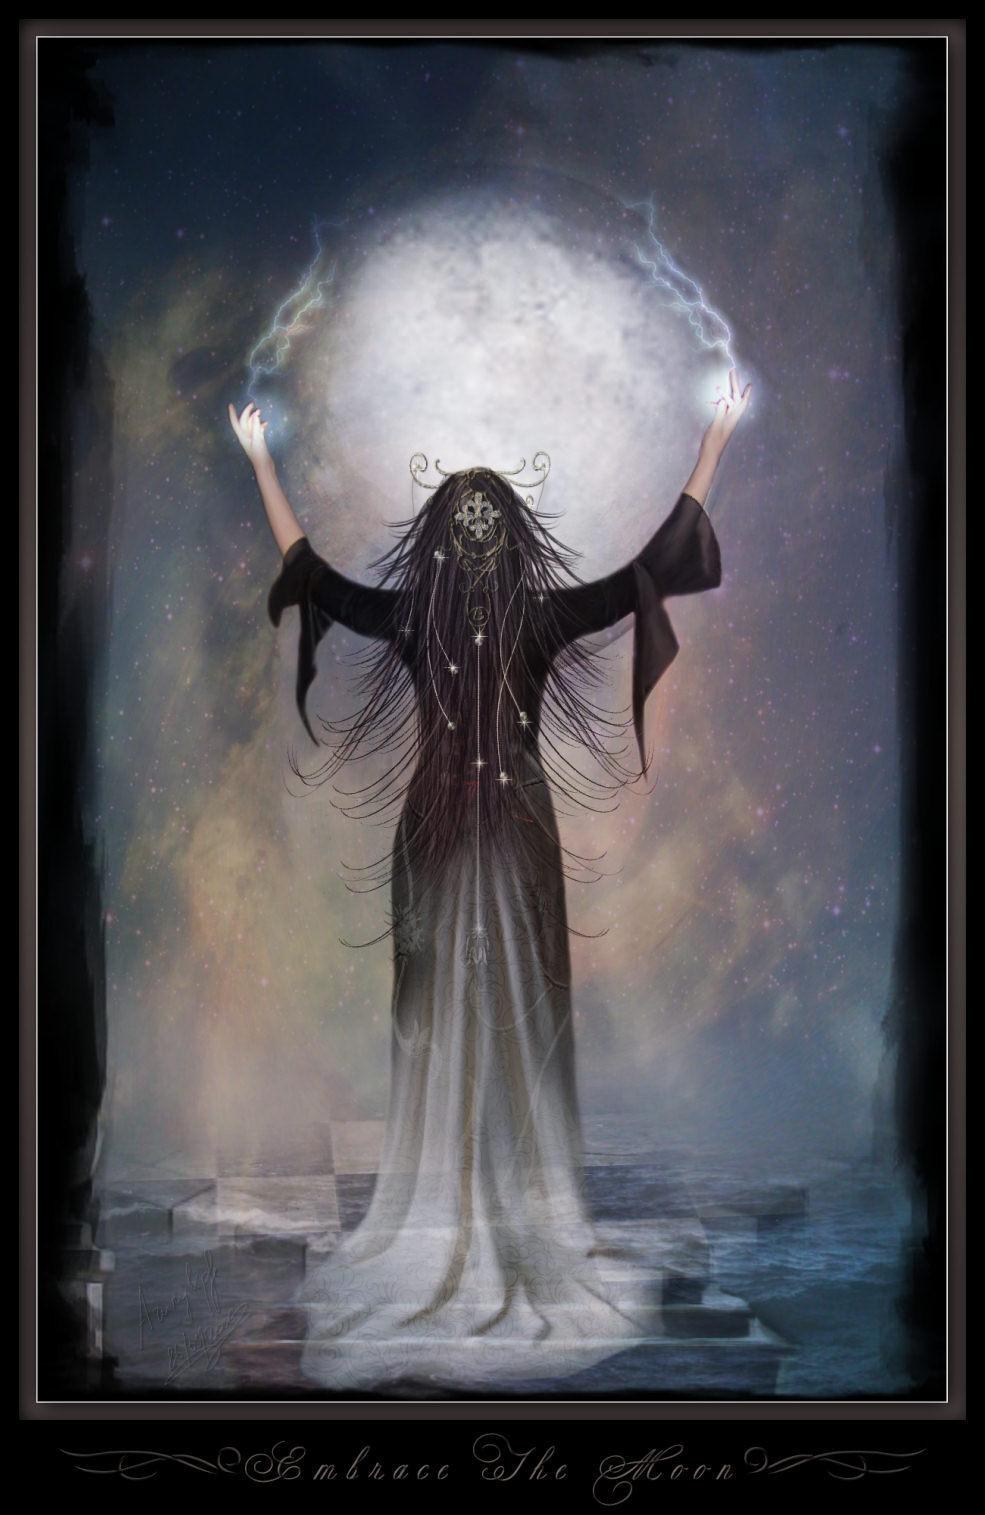 Moon Magic - Paganism Photo (17950593) - Fanpop